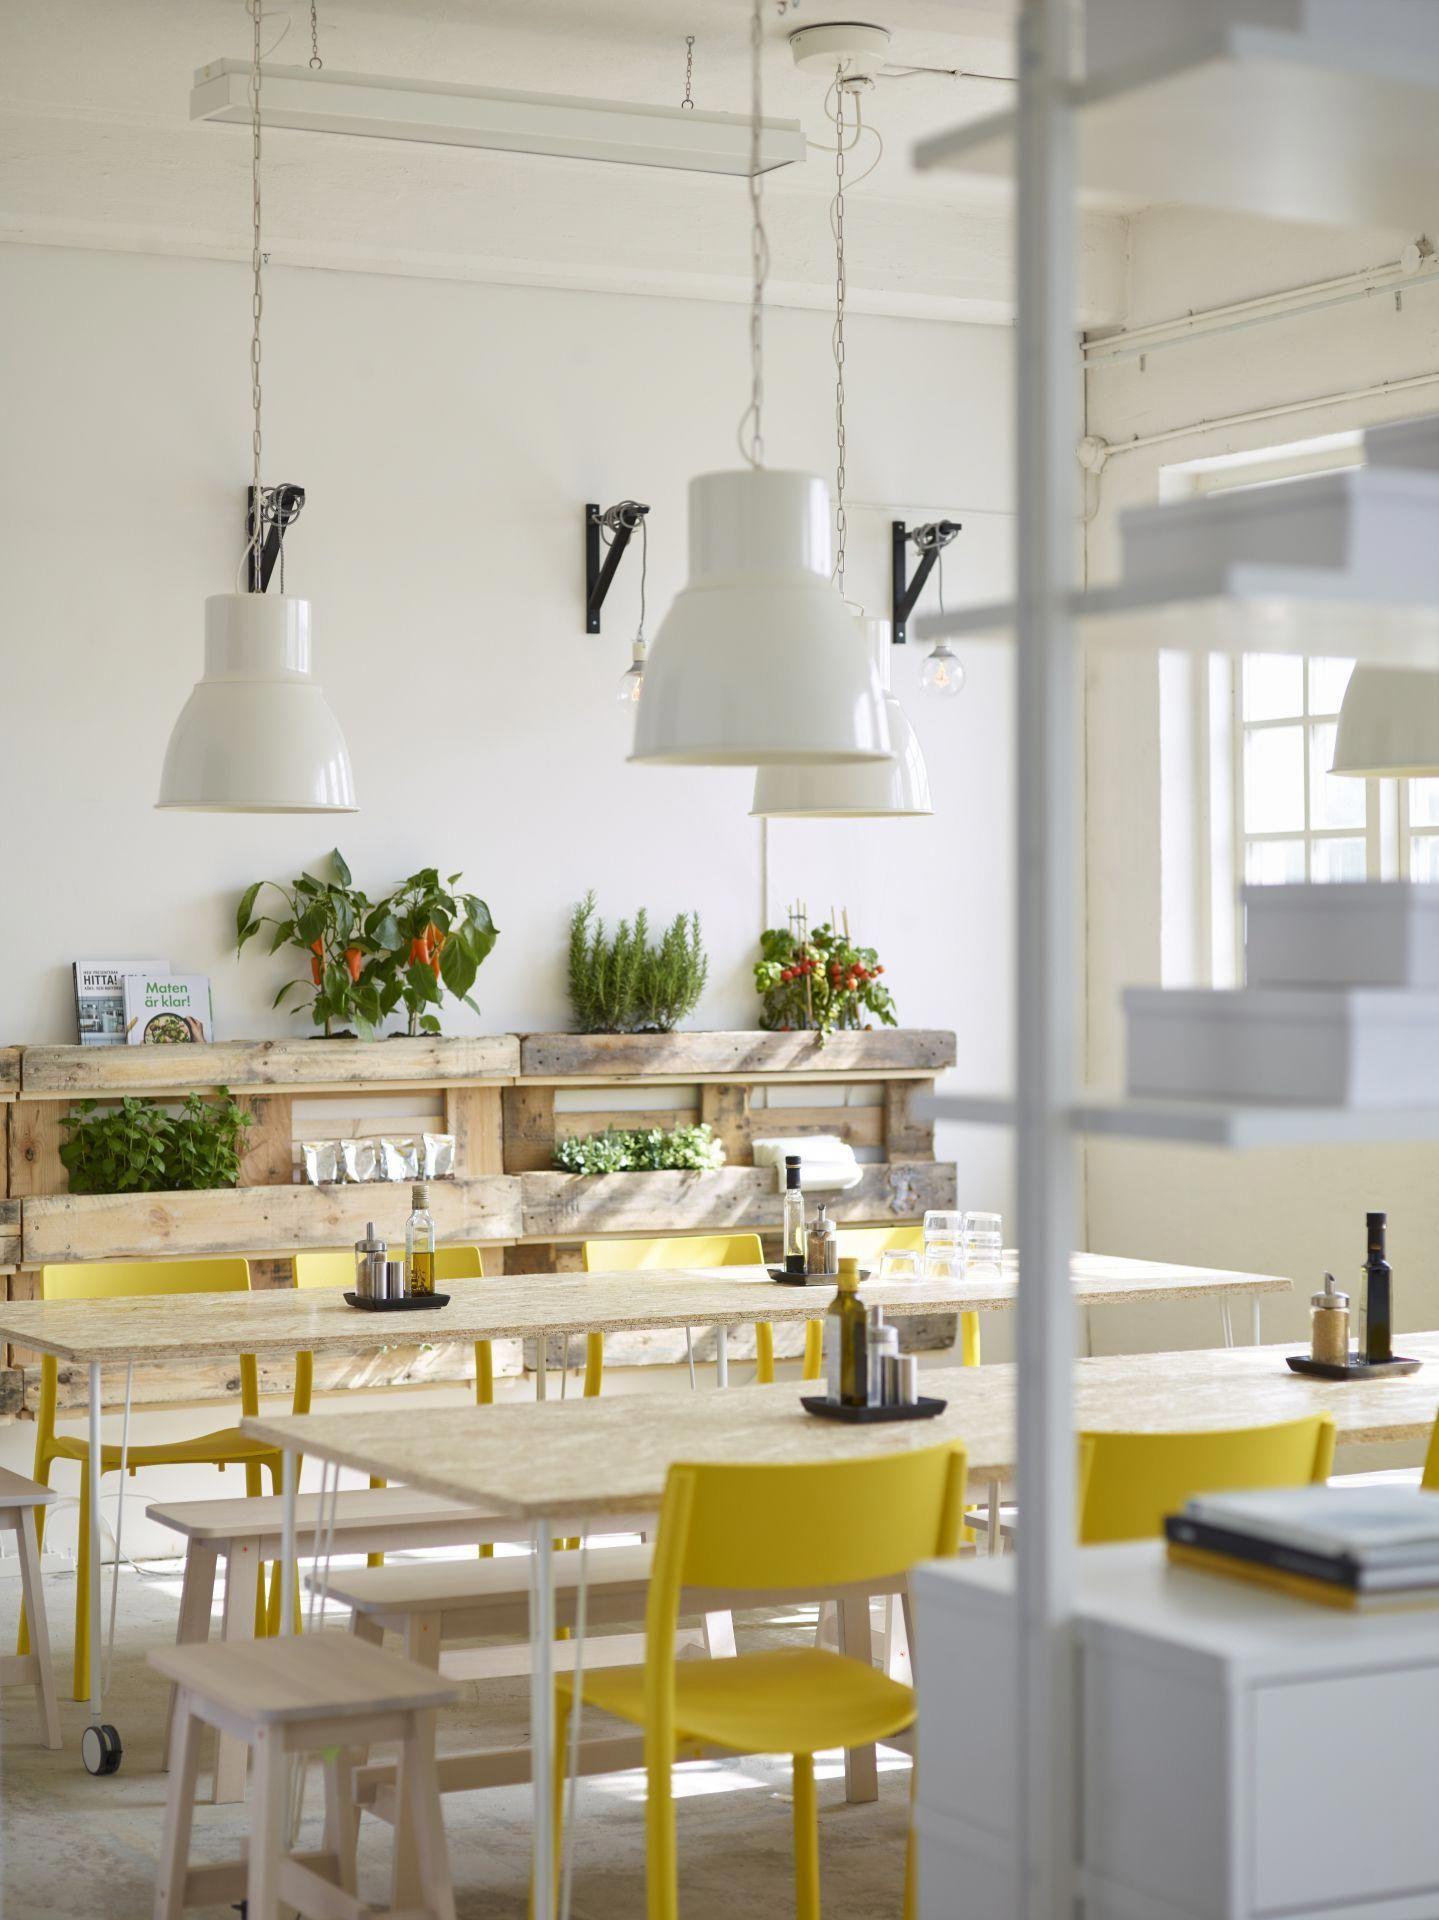 janinge eetkamerstoel ikea ikeanl ikeanederland inspiratie wooninspiratie interieur wooninterieur kamer woonkamer keuken slaapkamer werkplek kantoor